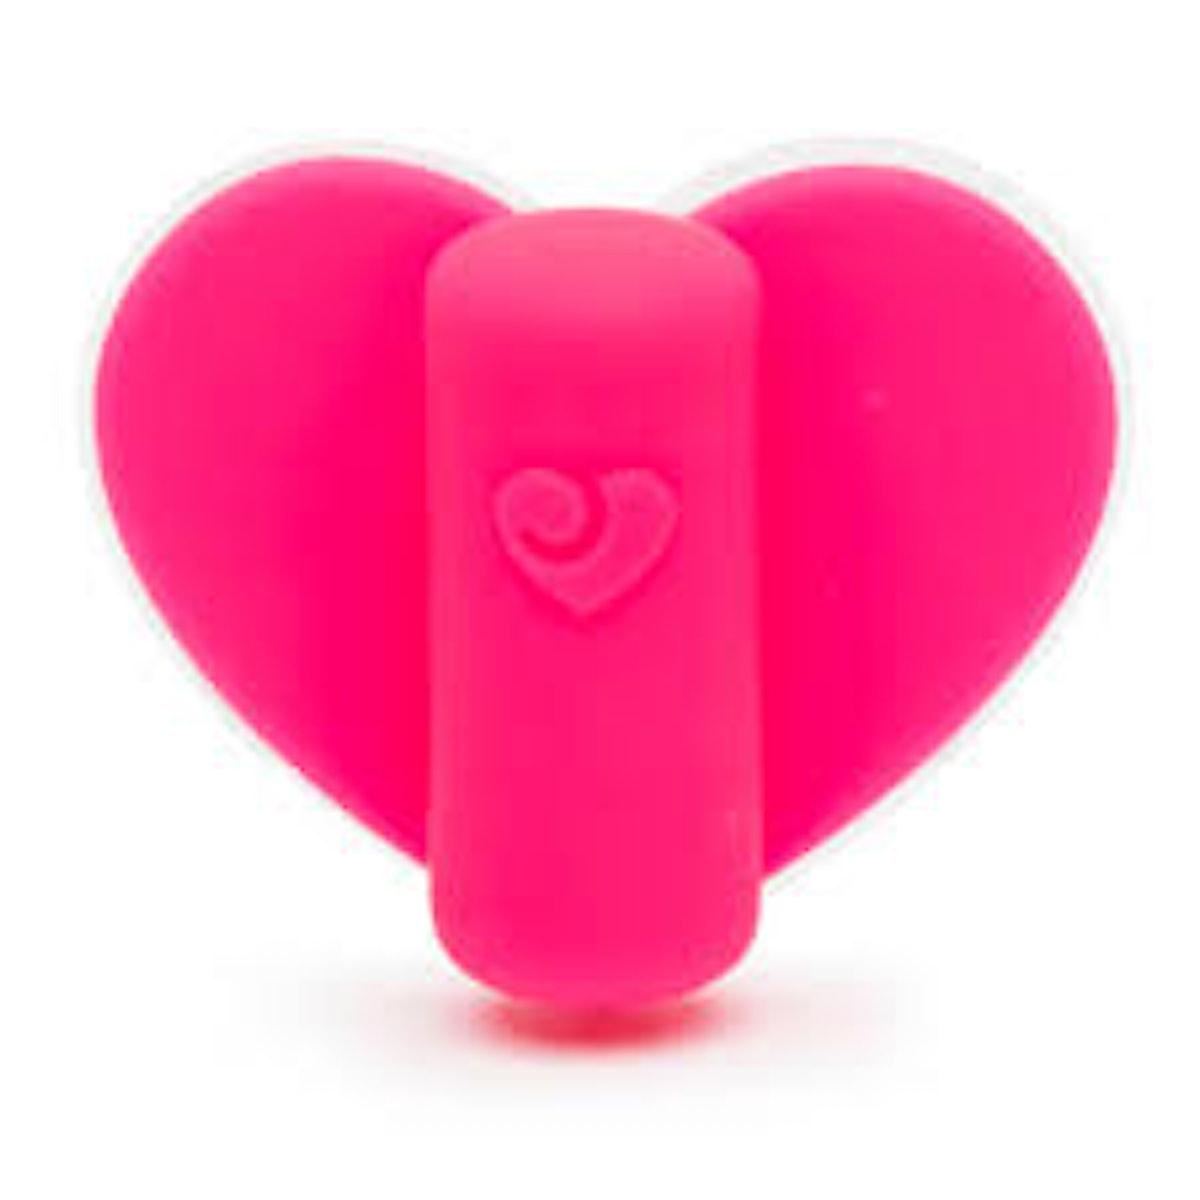 Stuck On Love Clitoral Heart Panty Vibrator